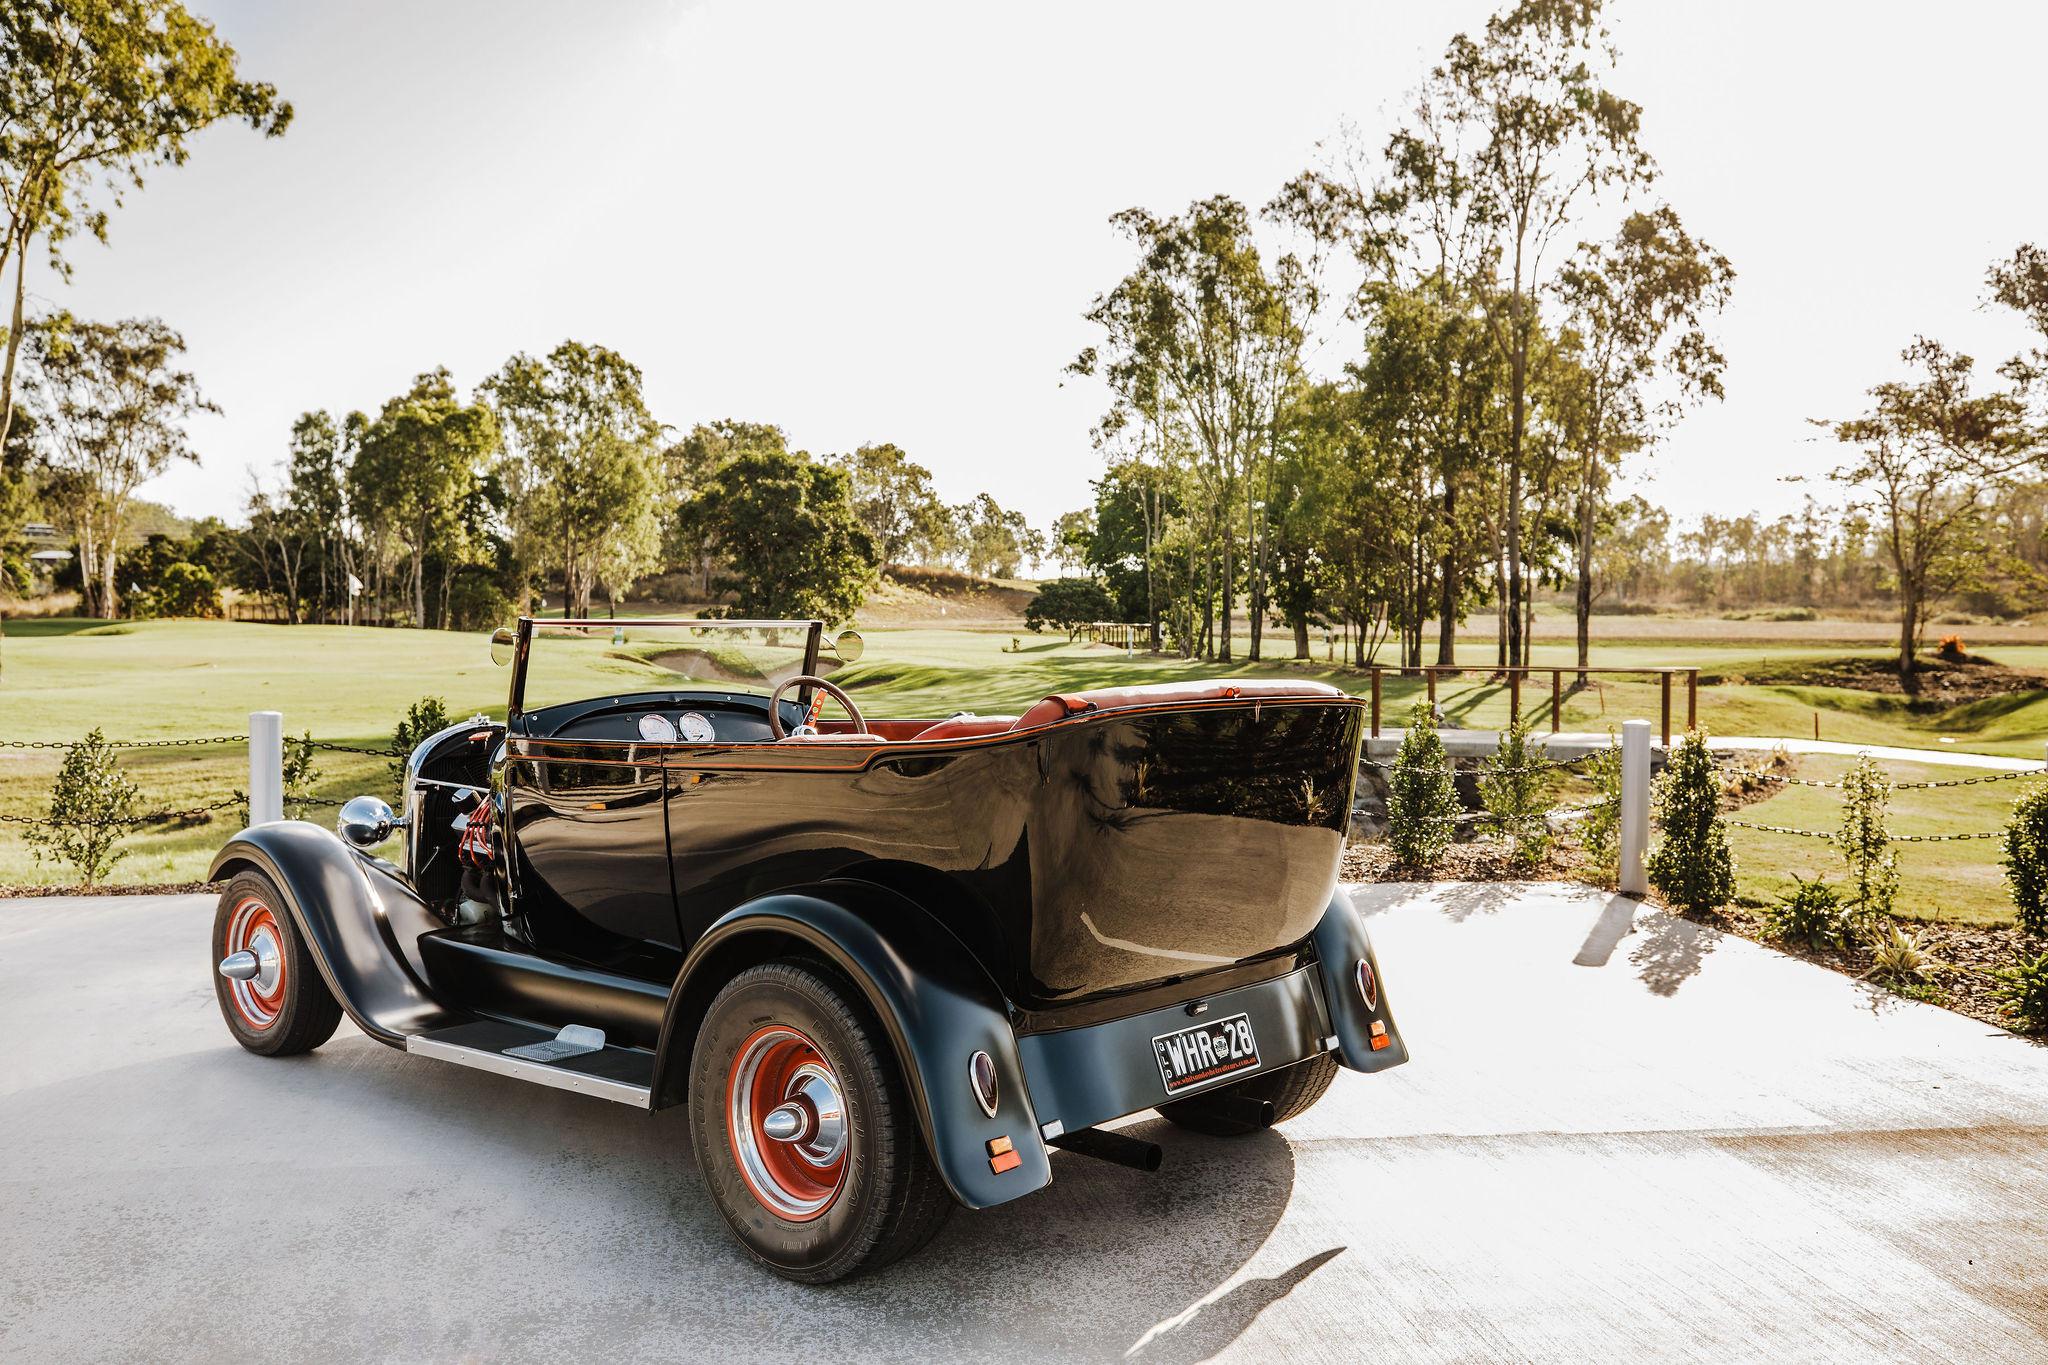 VIP Experience | Drive, Dine & Golf